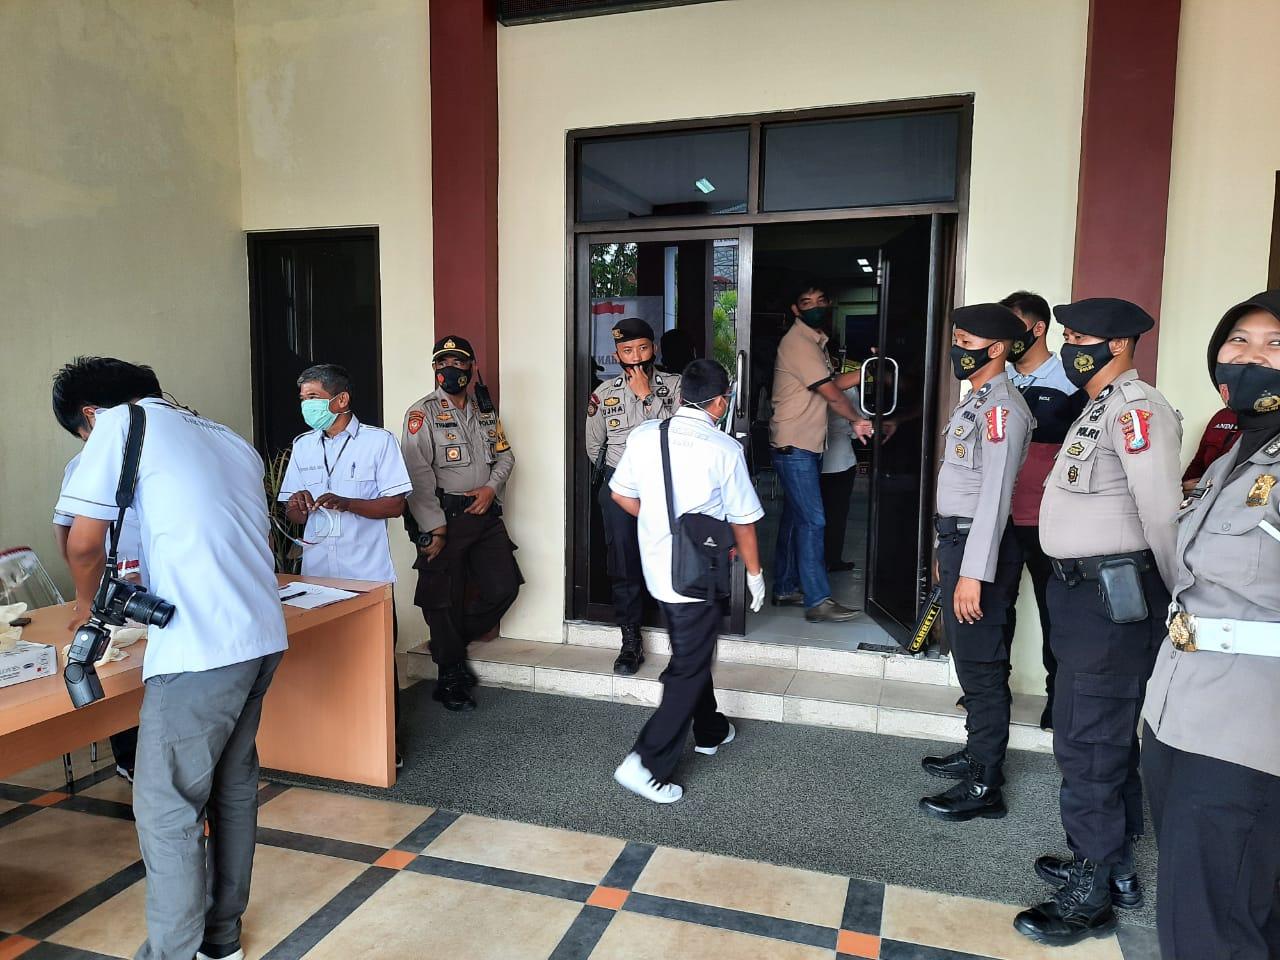 Kapolres Majene Pastikan Pengamanan Debat Publik Aman Terkendali